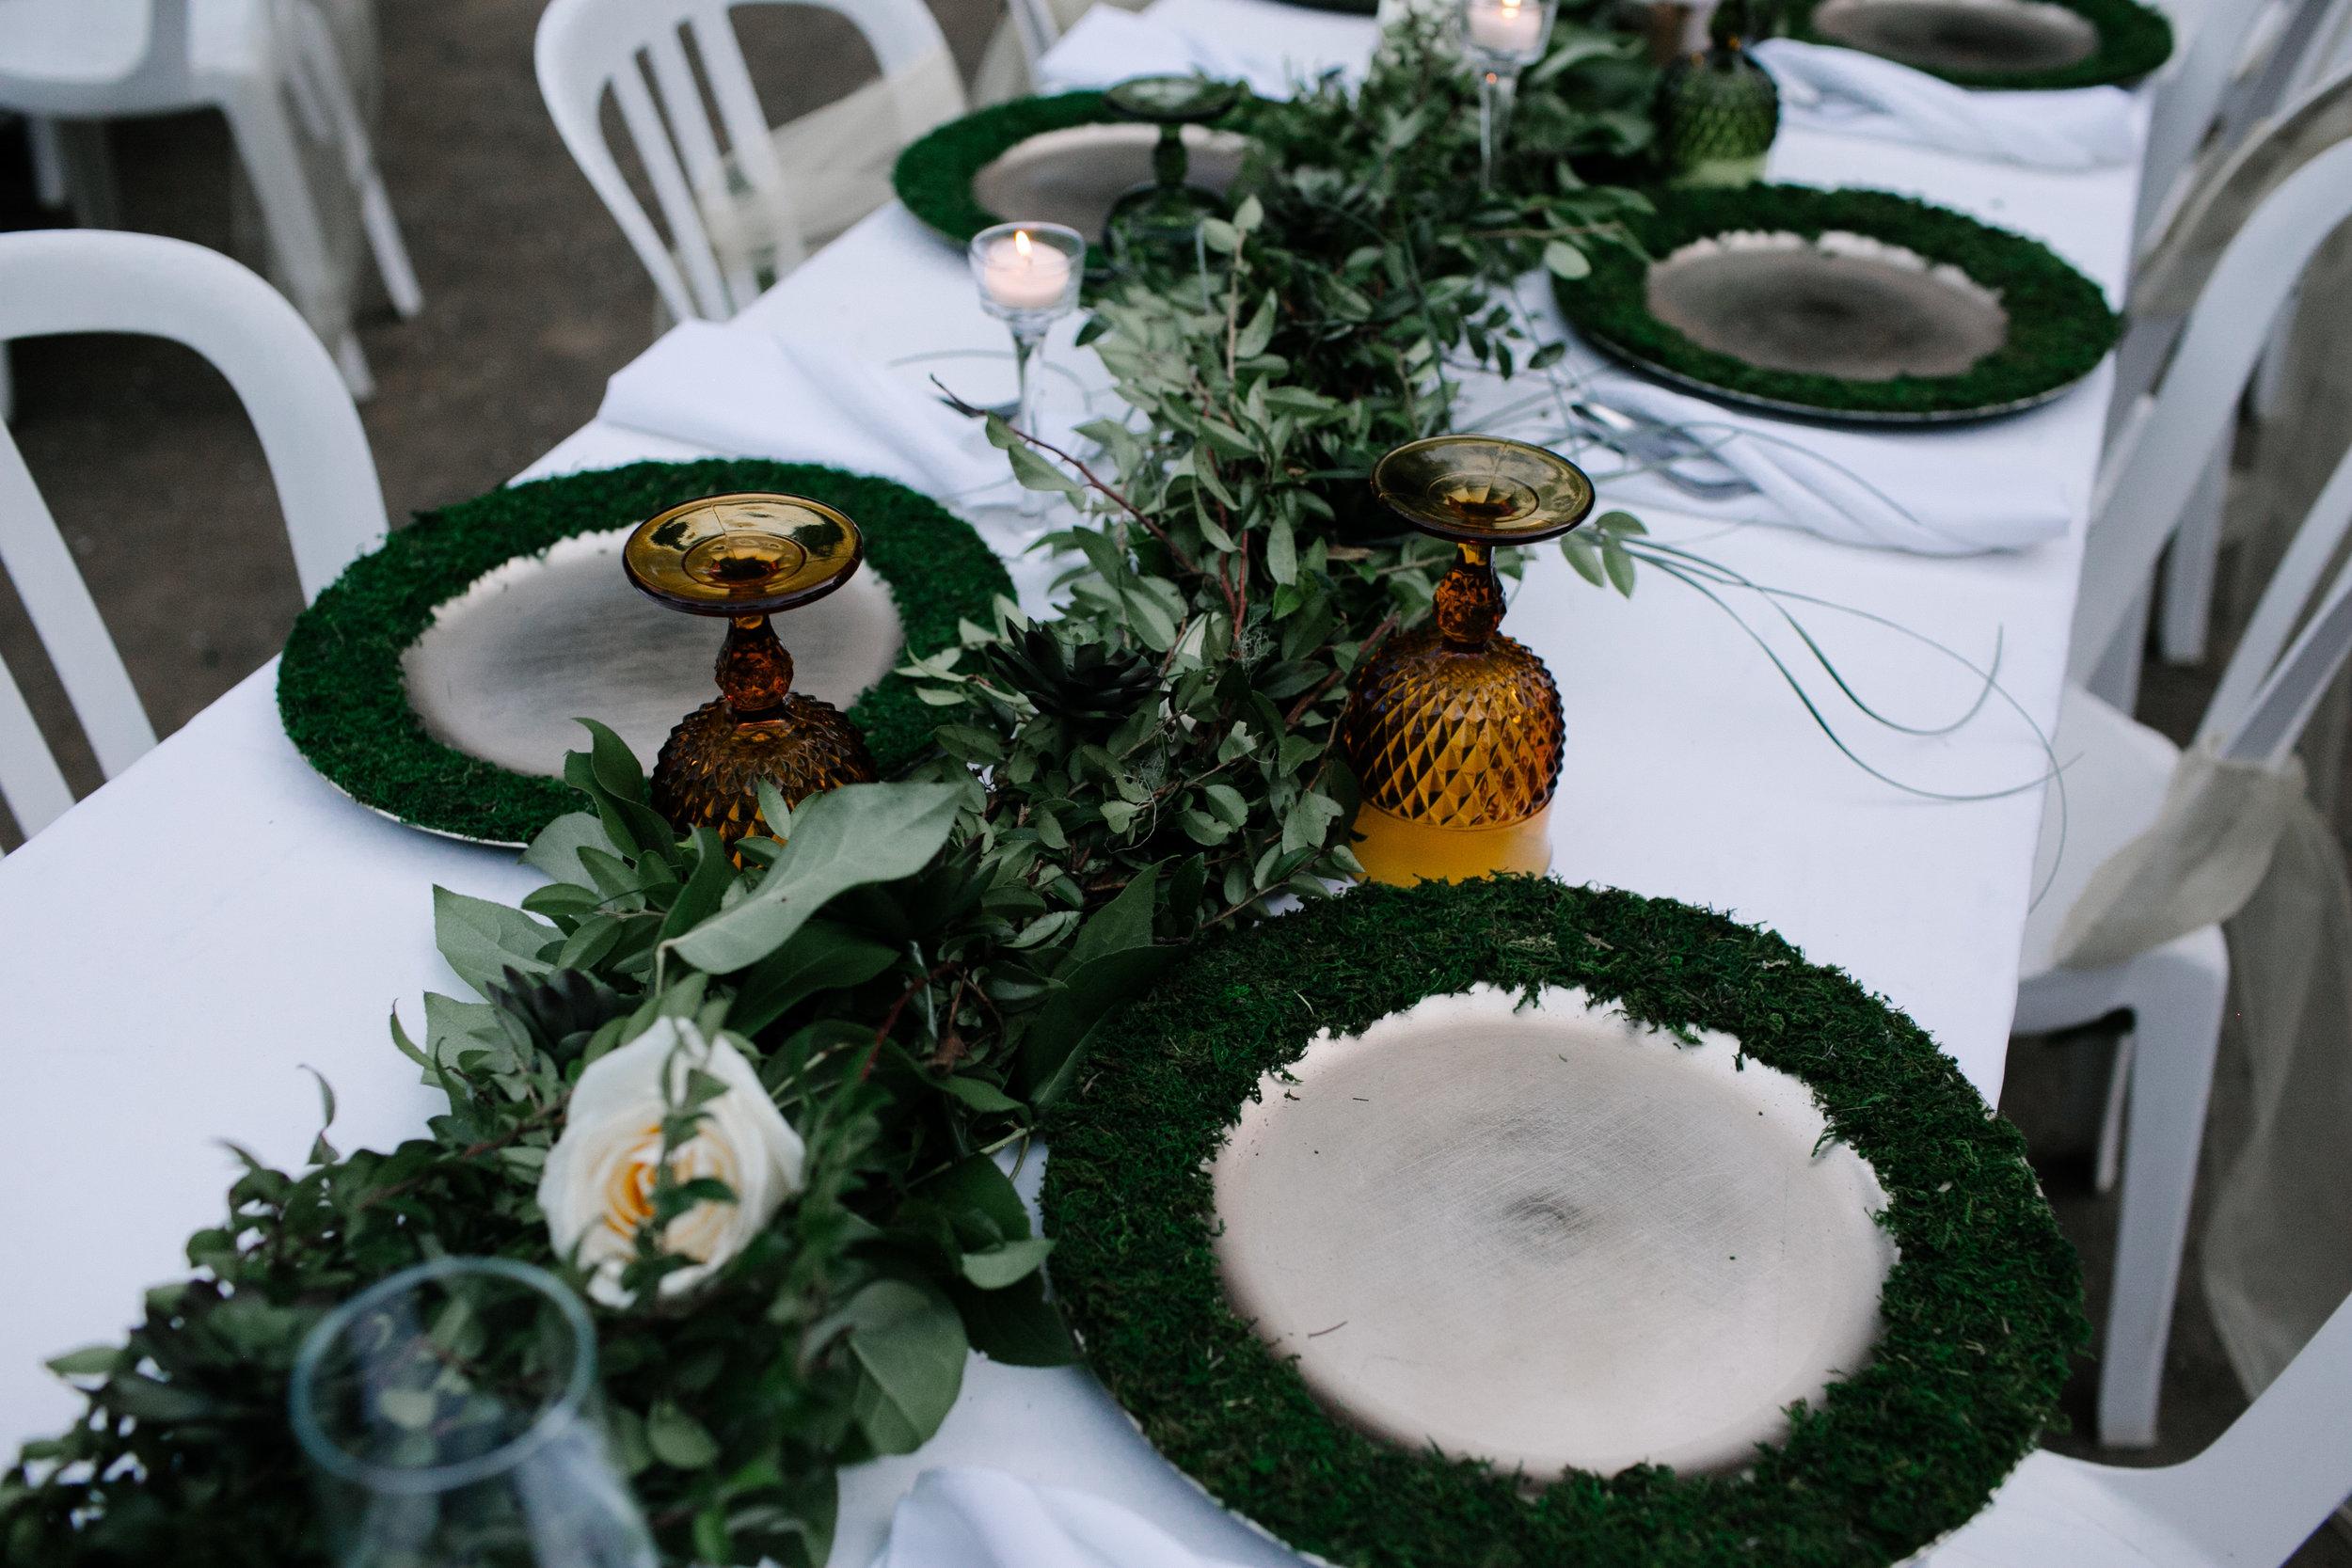 Sevlynn-Photography-Teresa-Chandler-Wedding-59.jpg